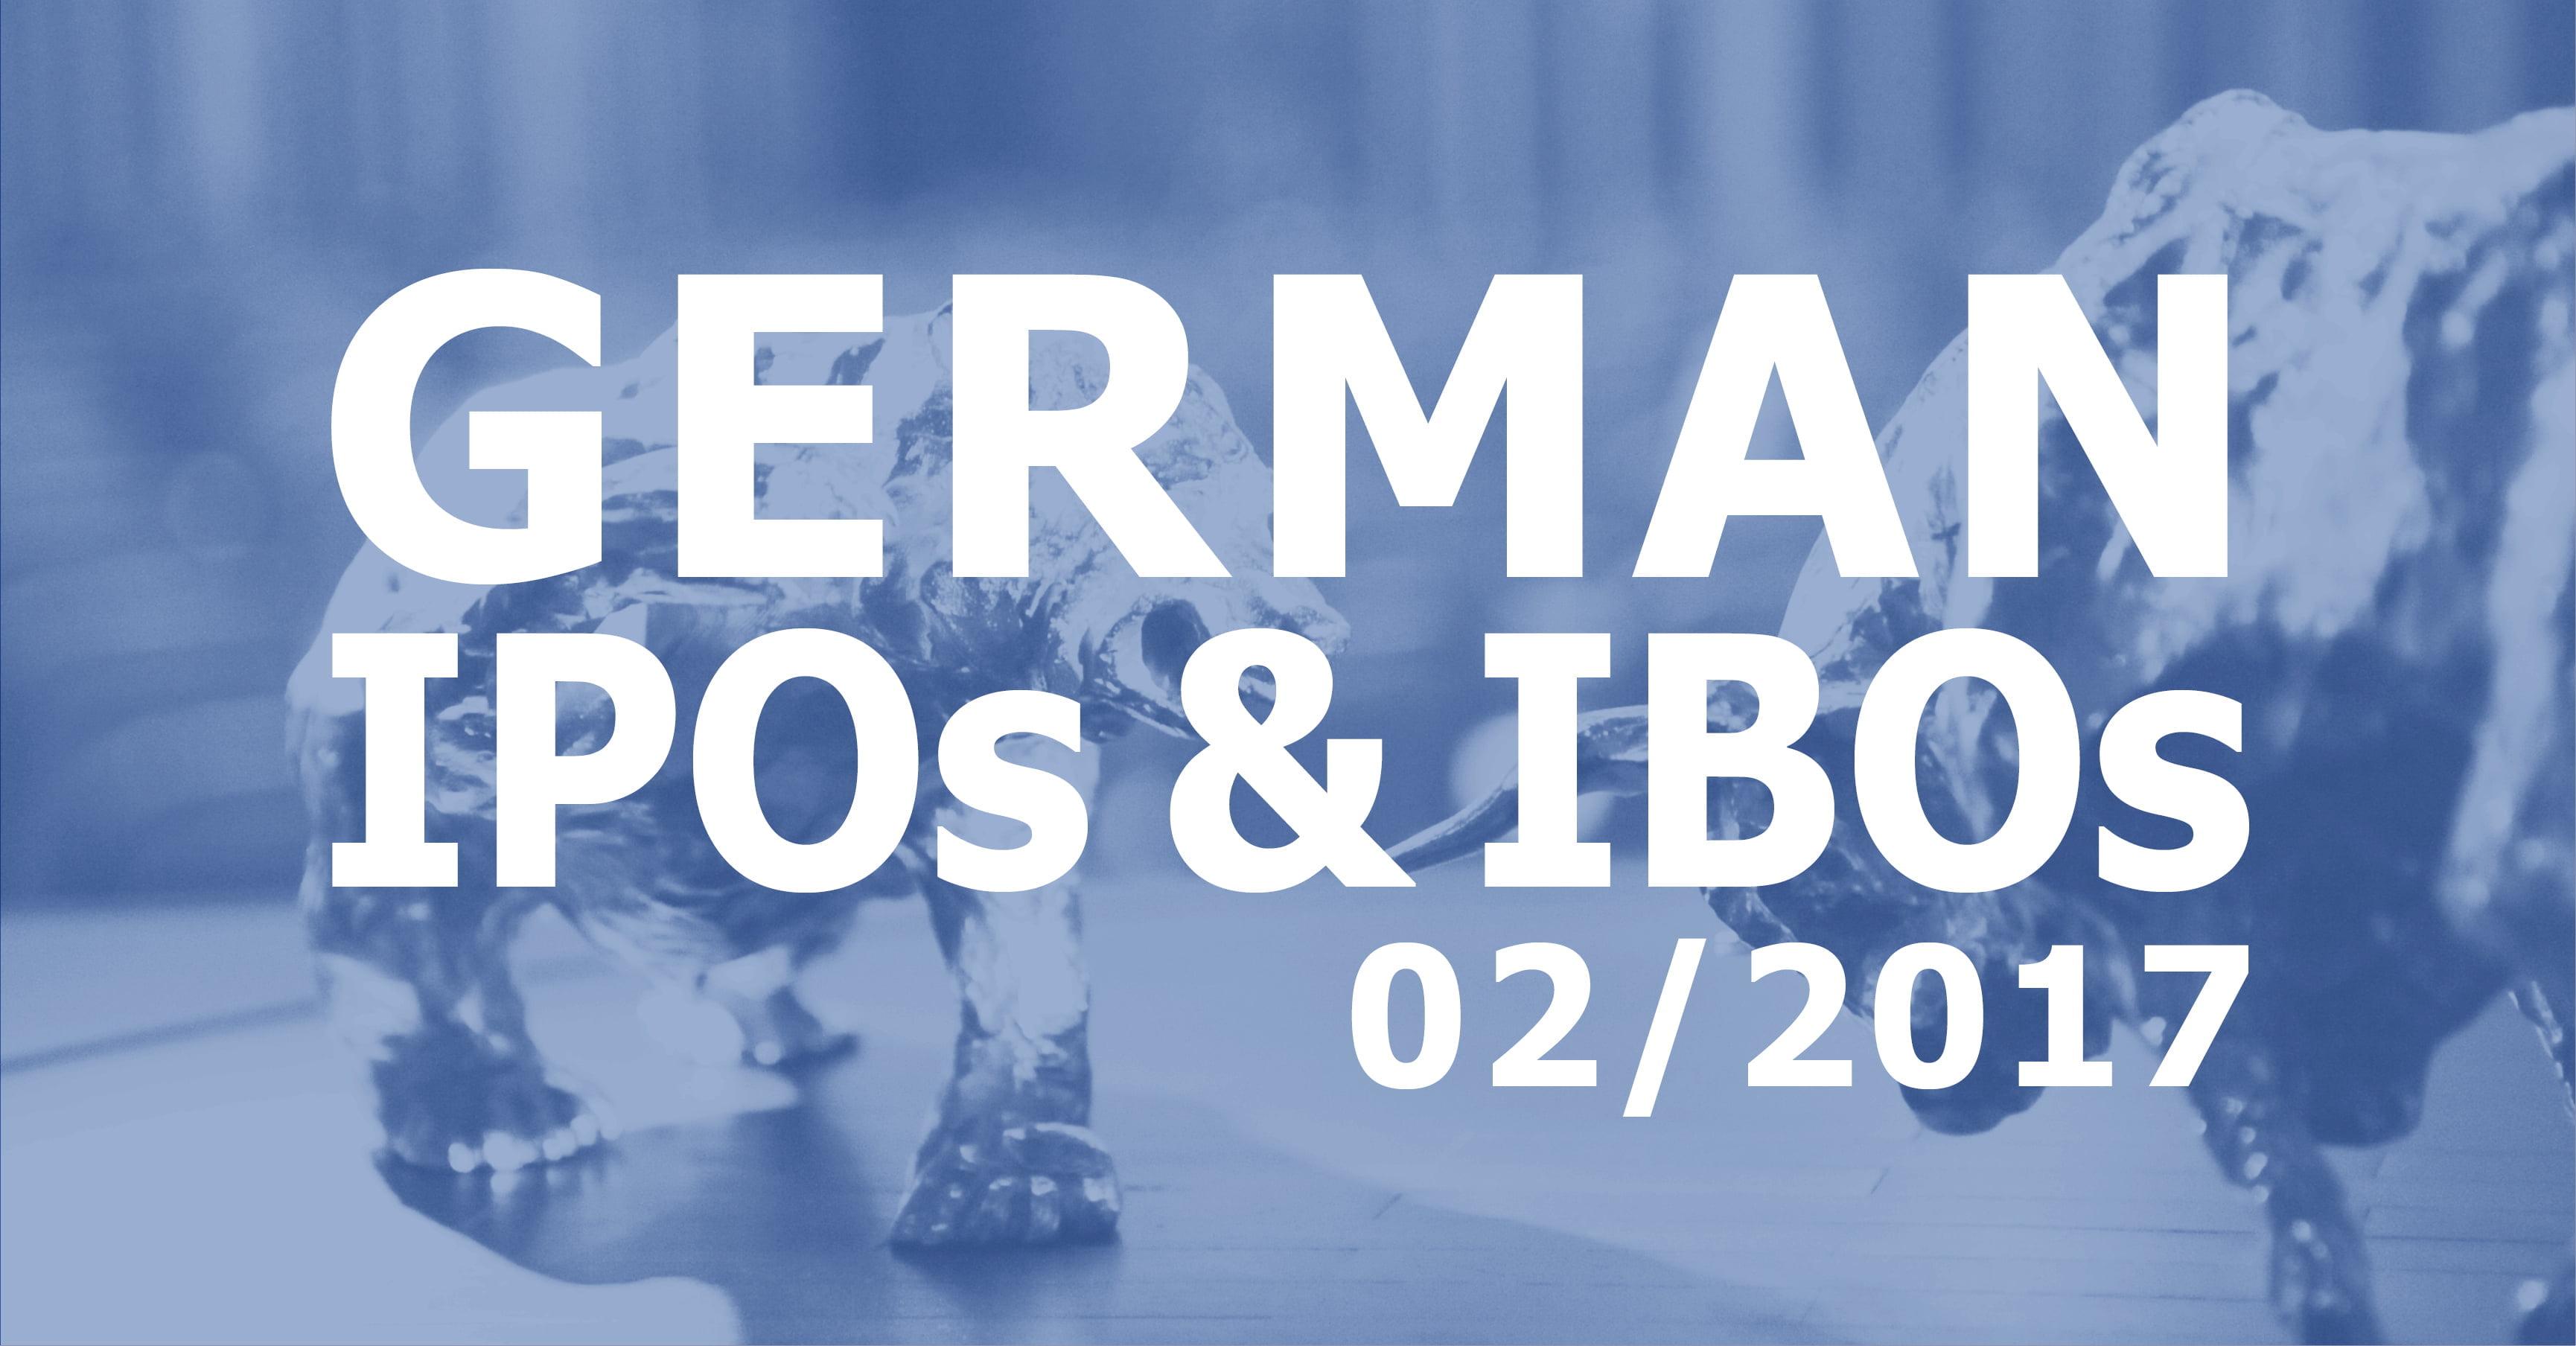 German IPOs and IBOs 02/2017